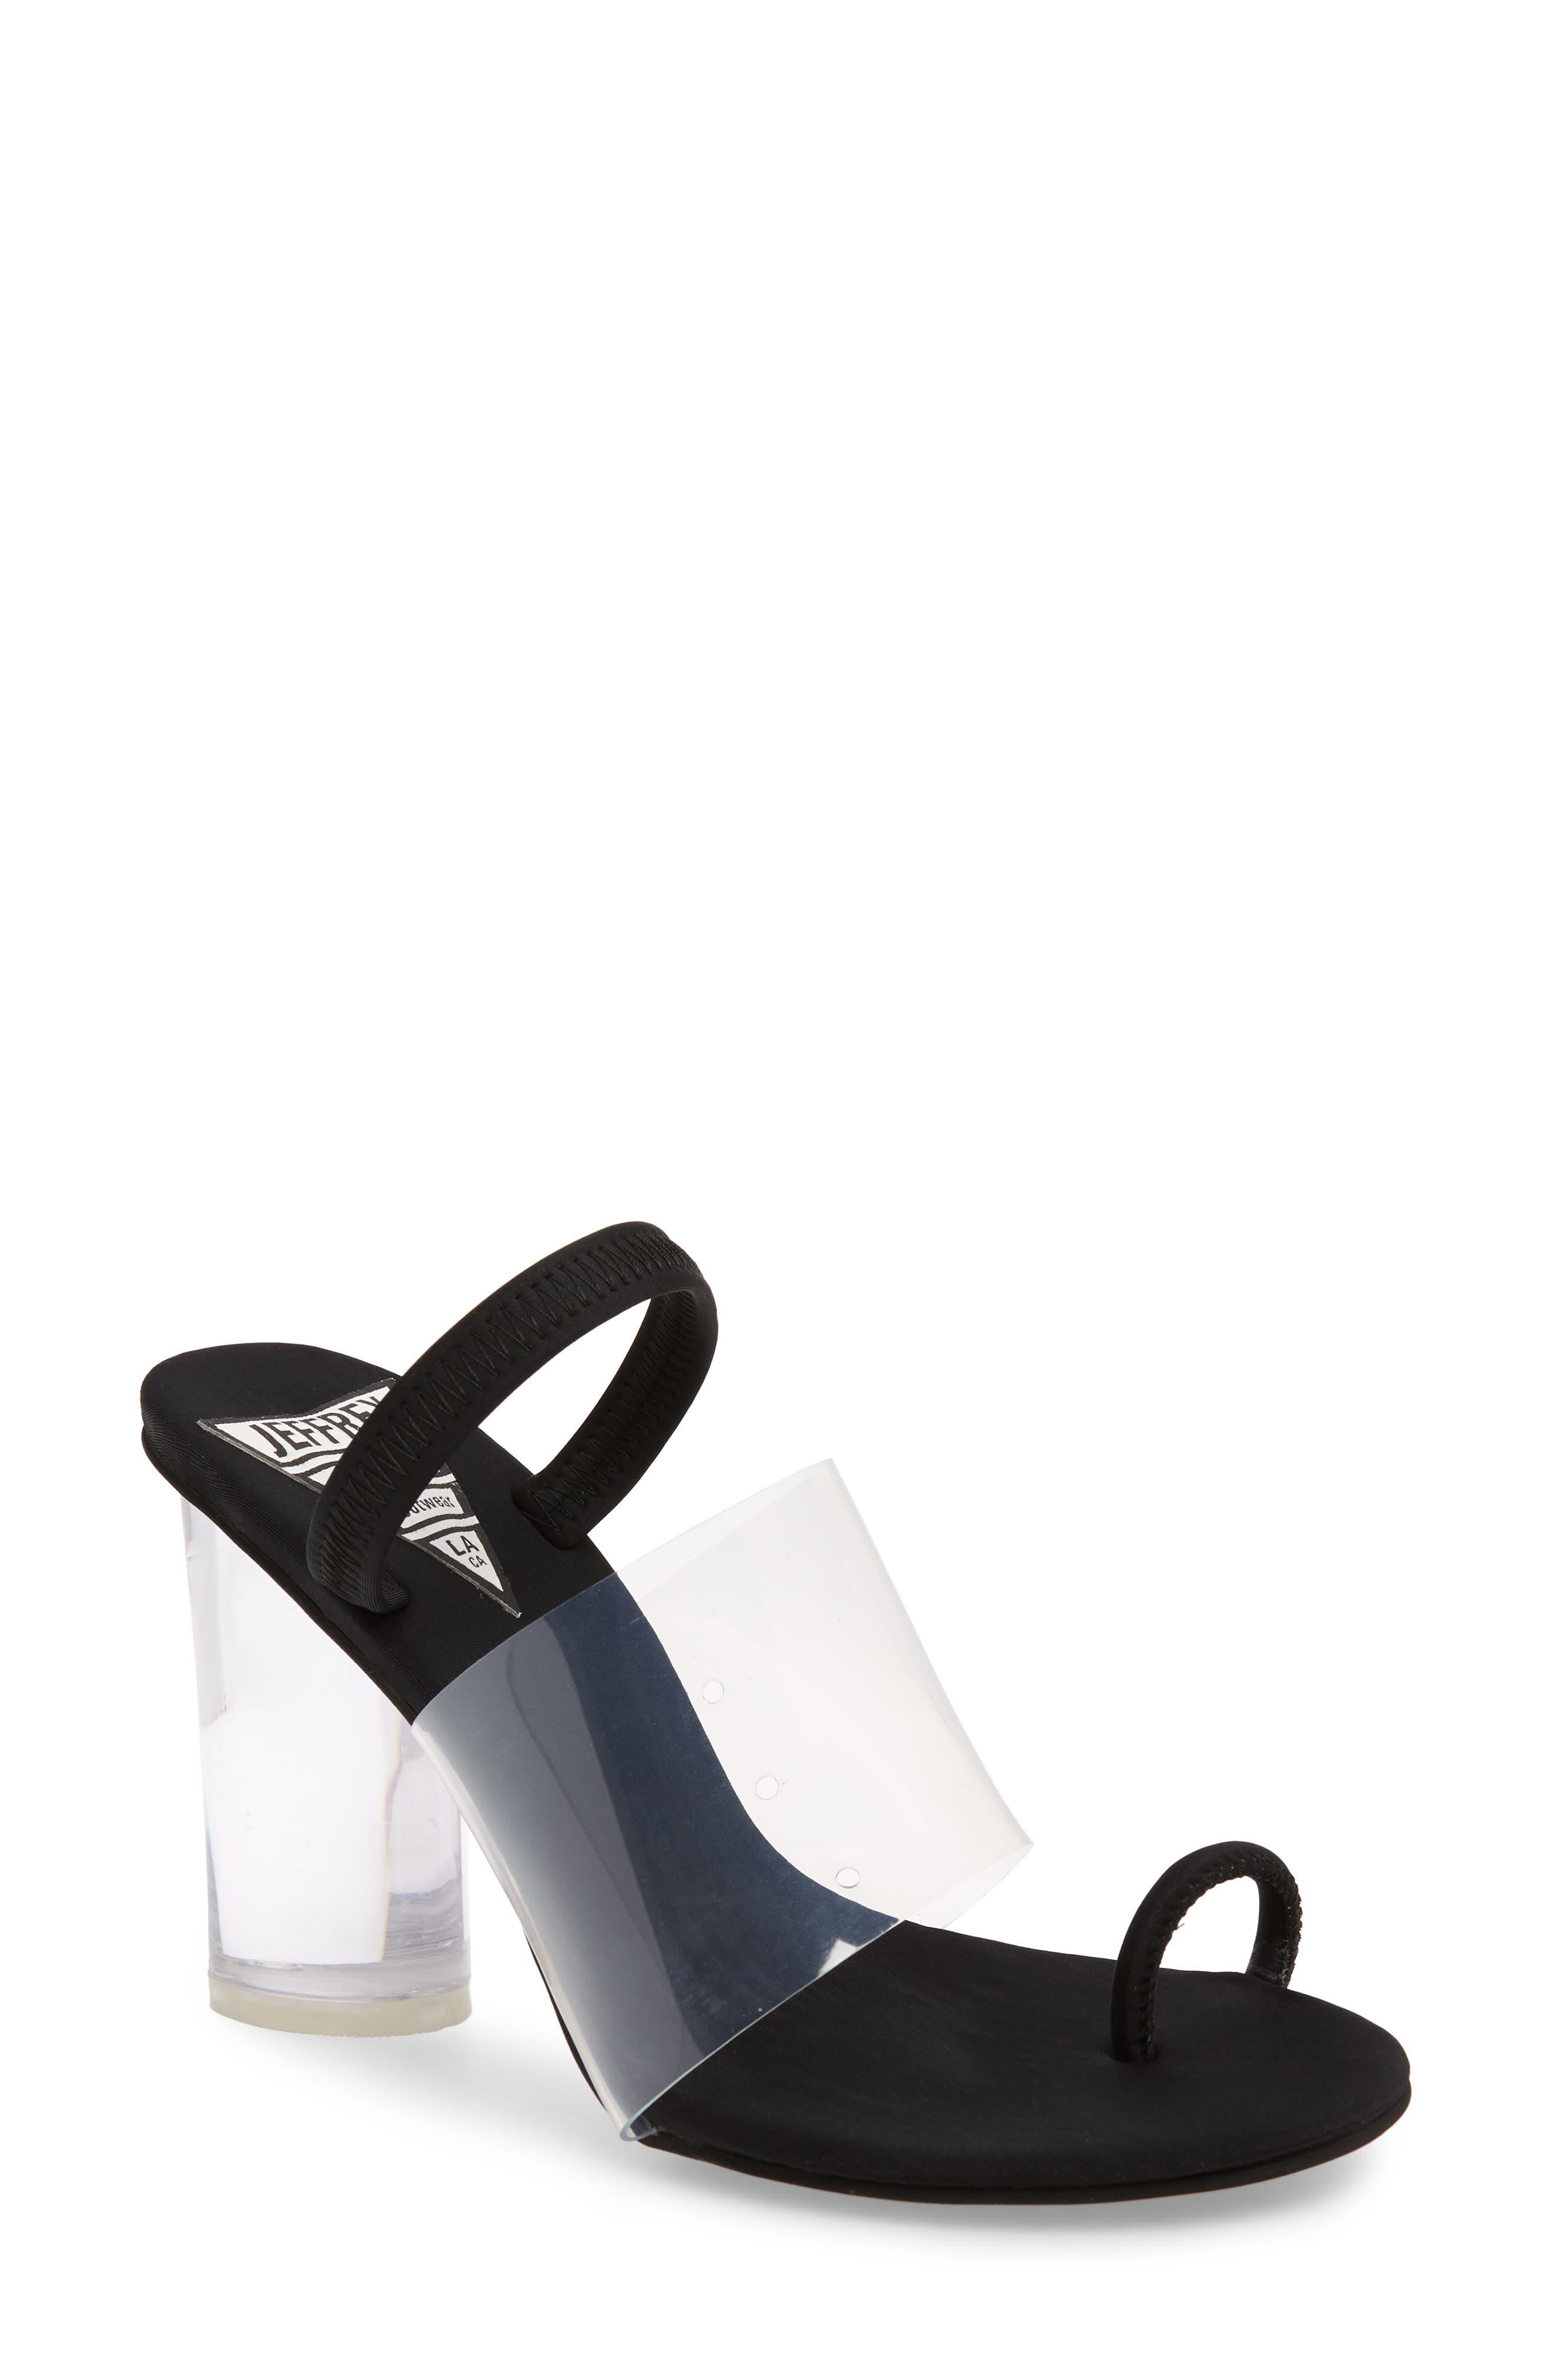 Mania Clear Toe Loop Sandal,                             Main thumbnail 1, color,                             BLACK FABRIC